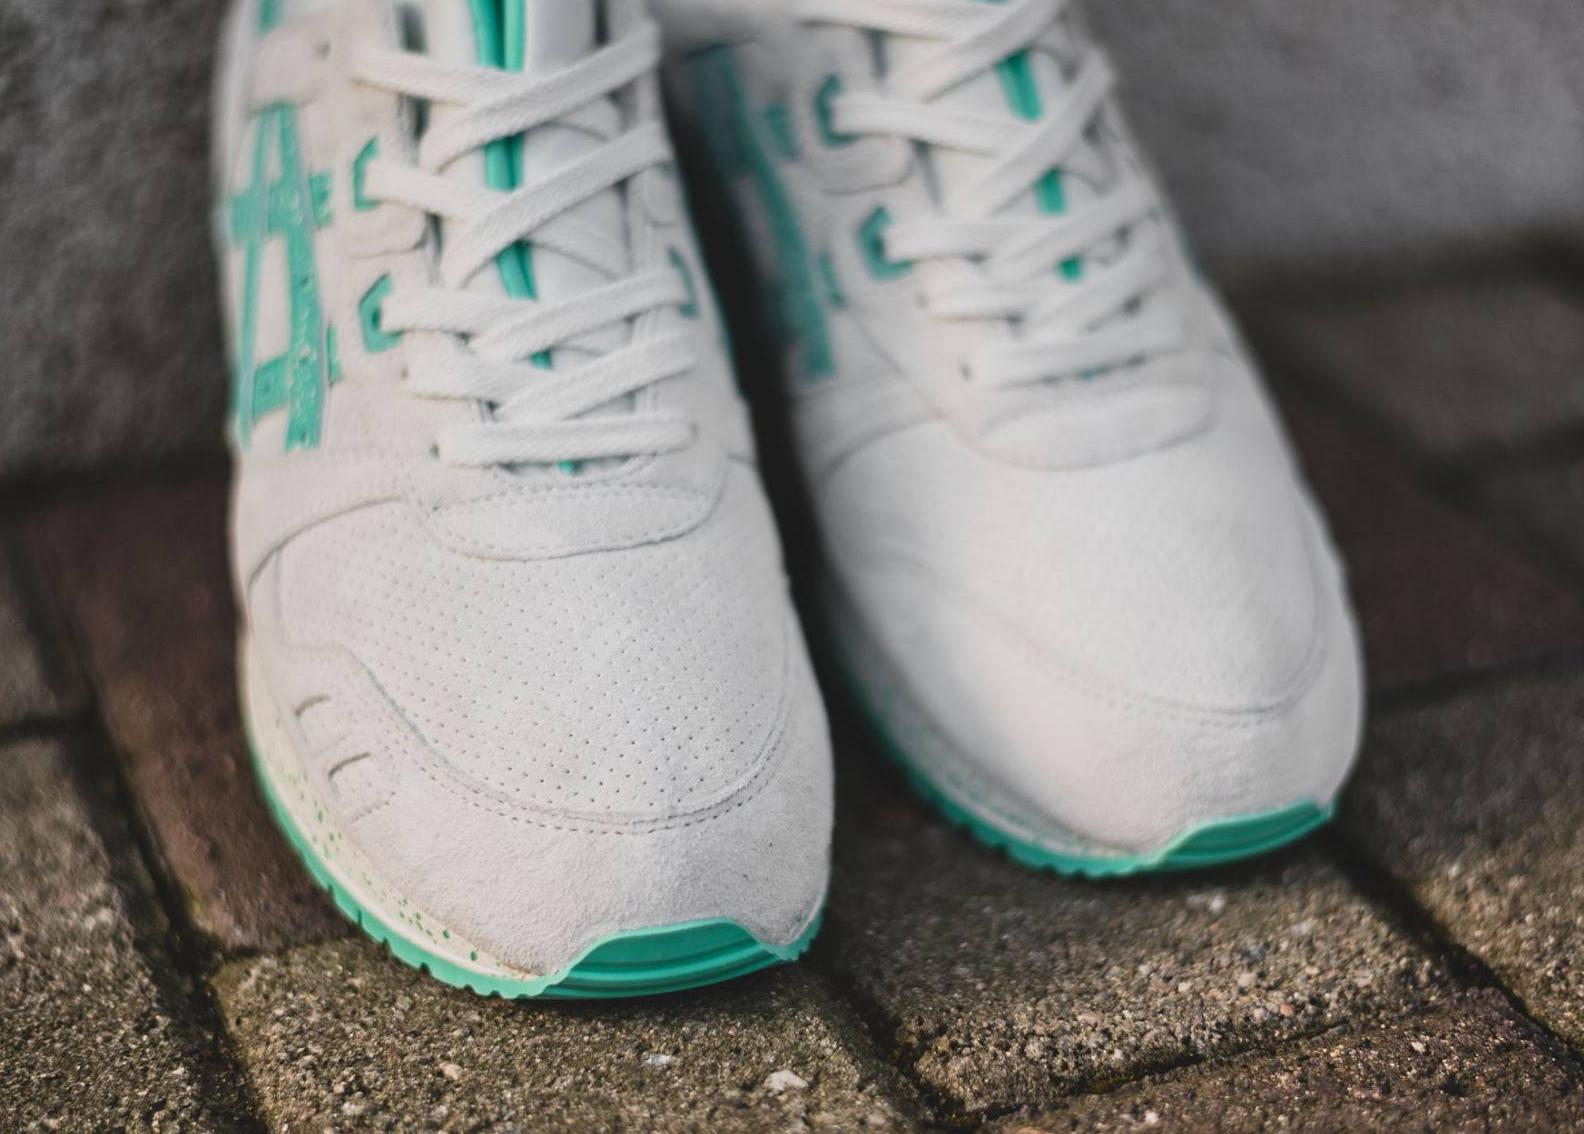 Chaussure Asics Gel Lyte III Maldives (2)